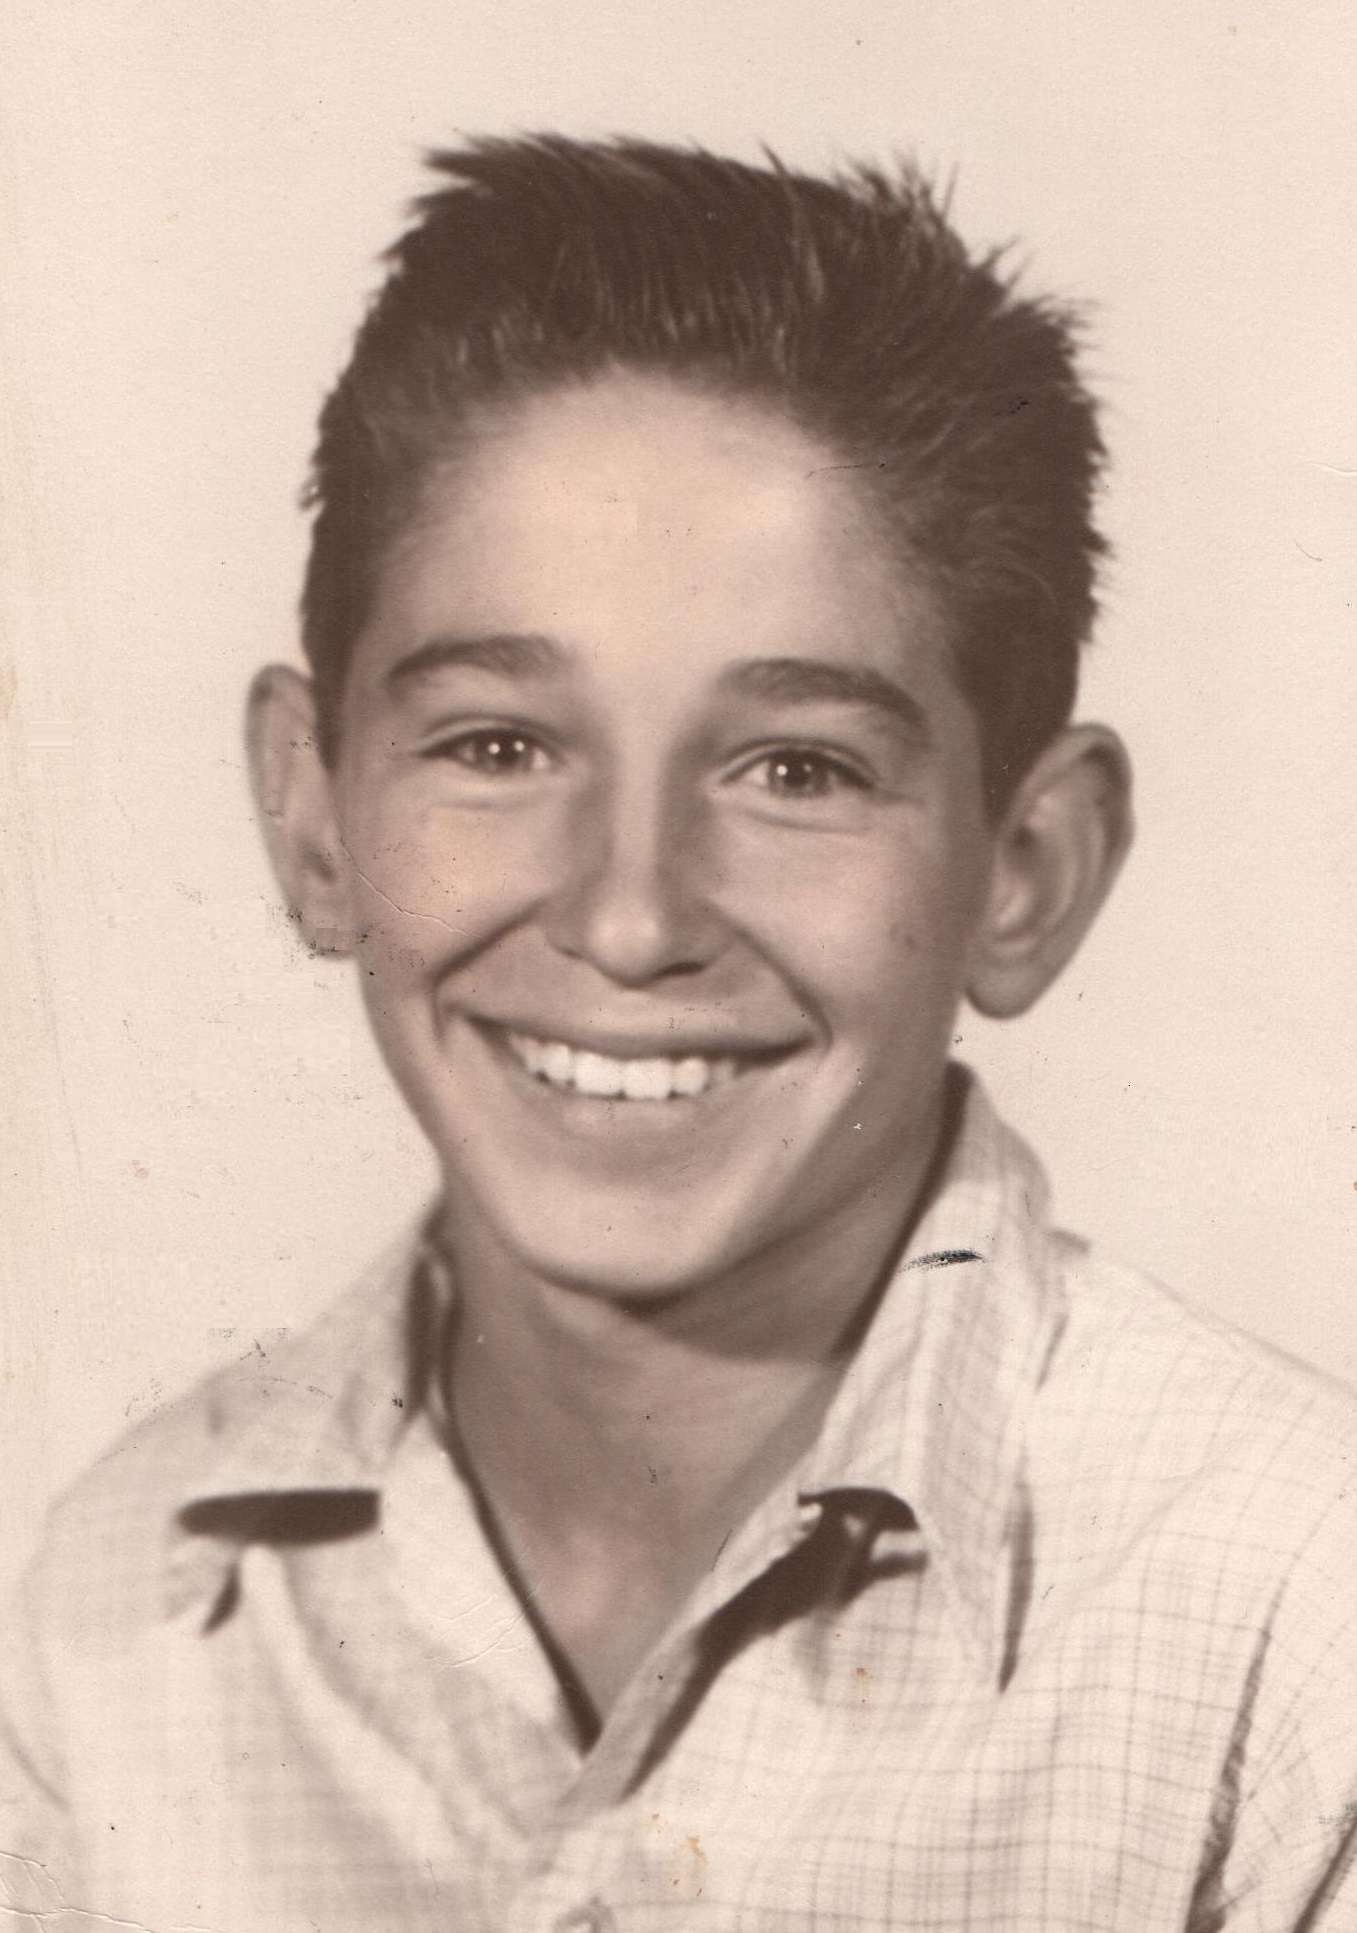 Charles, Age 13